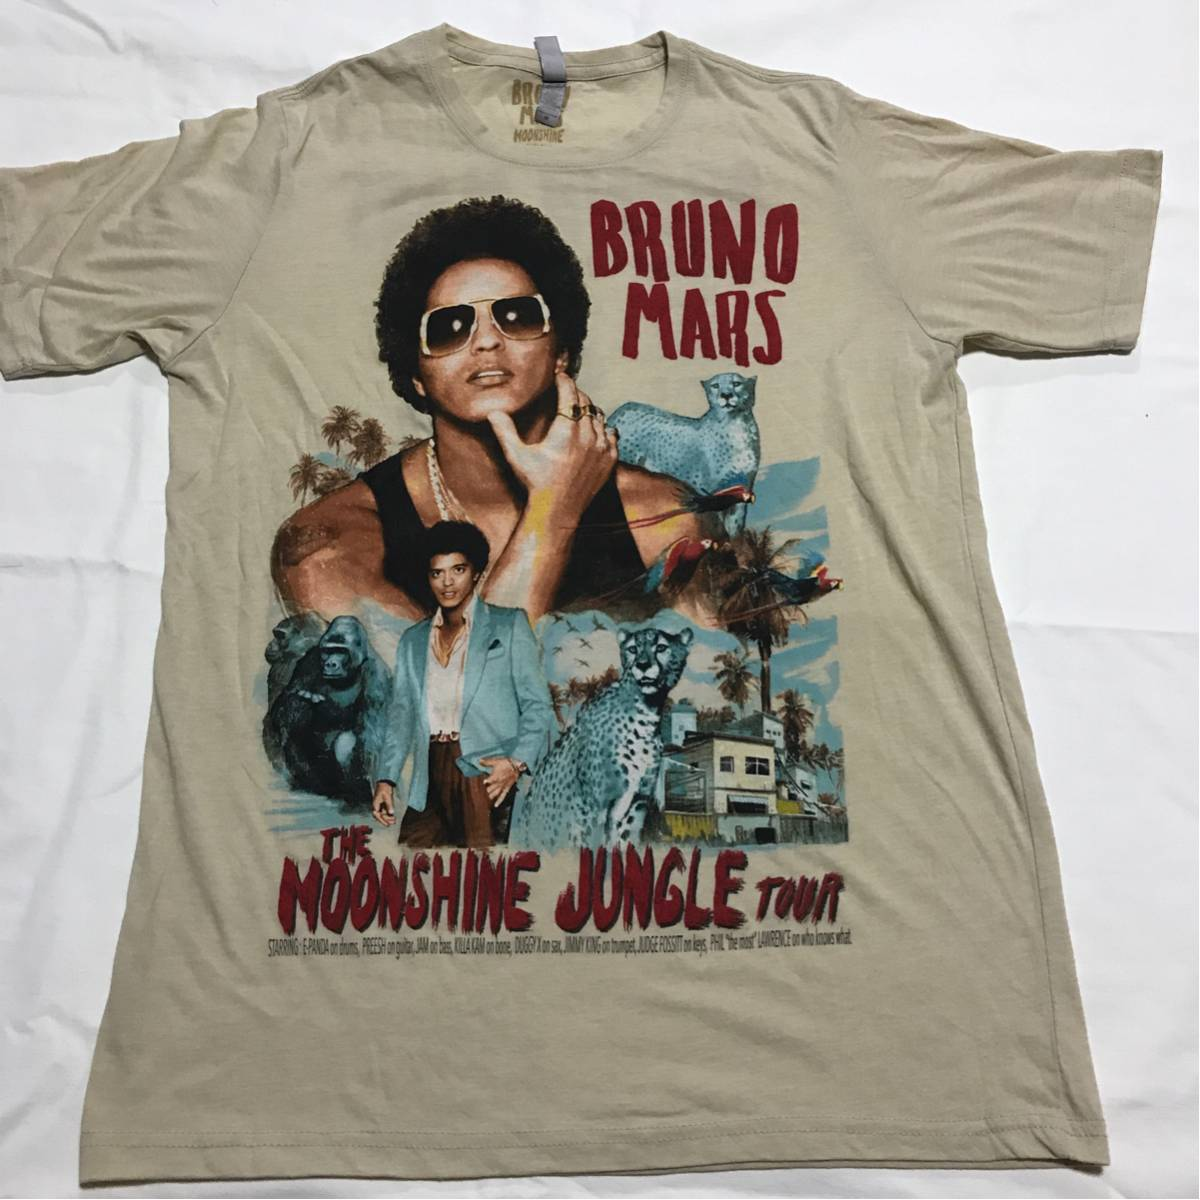 BRUNO MARS ブルーノ マーズ TOUR Tシャツ rap tee tees hiphop vintage レア kanye wu tang la 2pac snoop hawaii exile gucci 美品